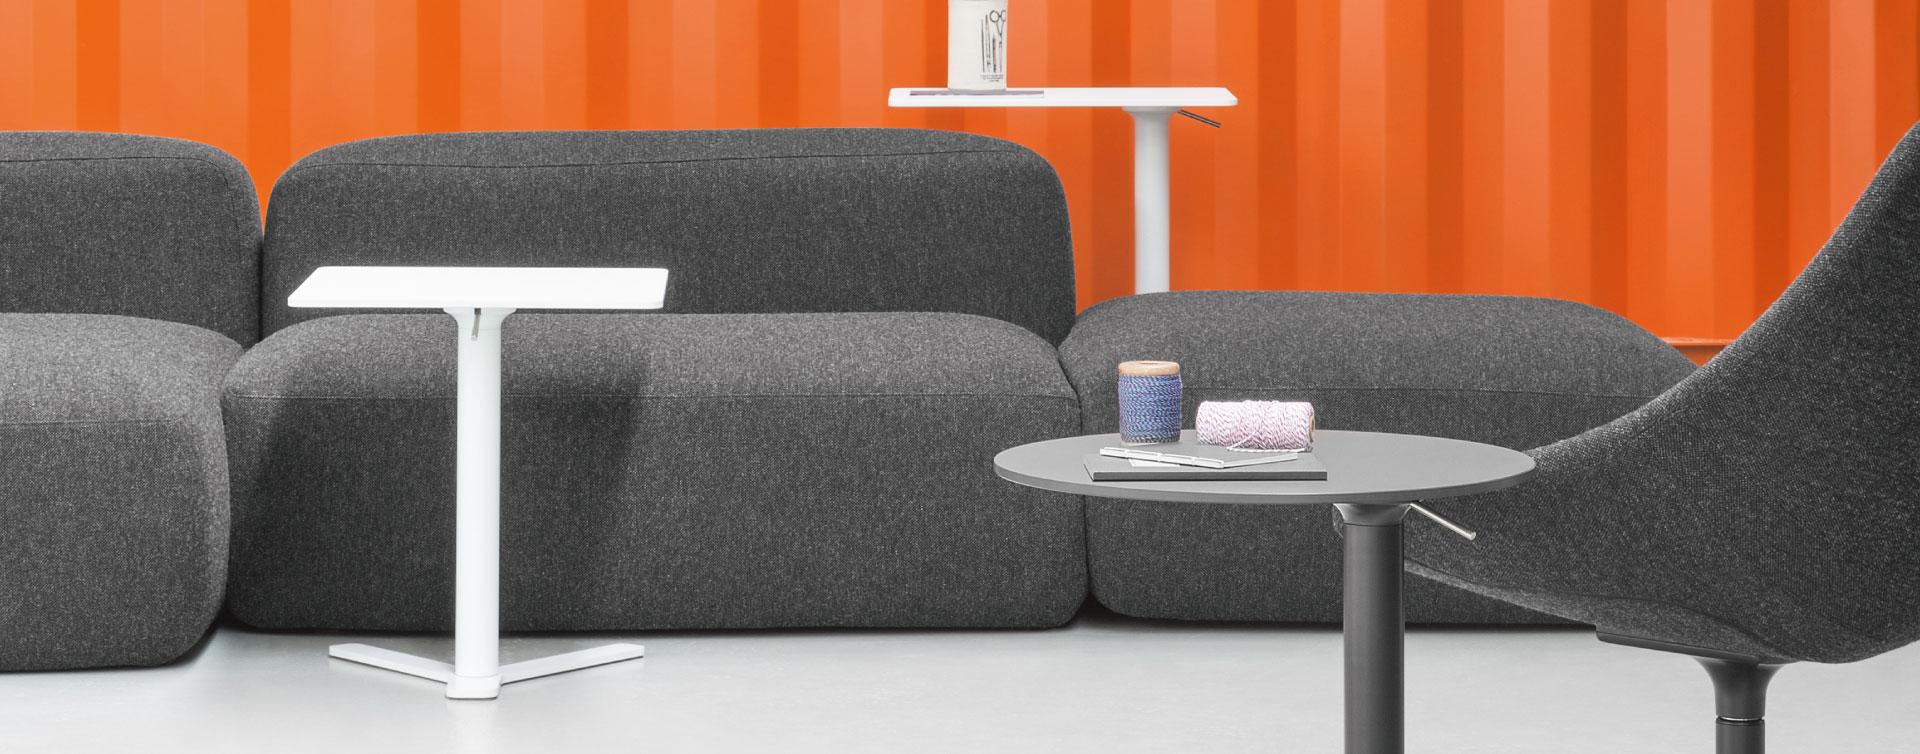 Modern Design Small Tables Lapalma